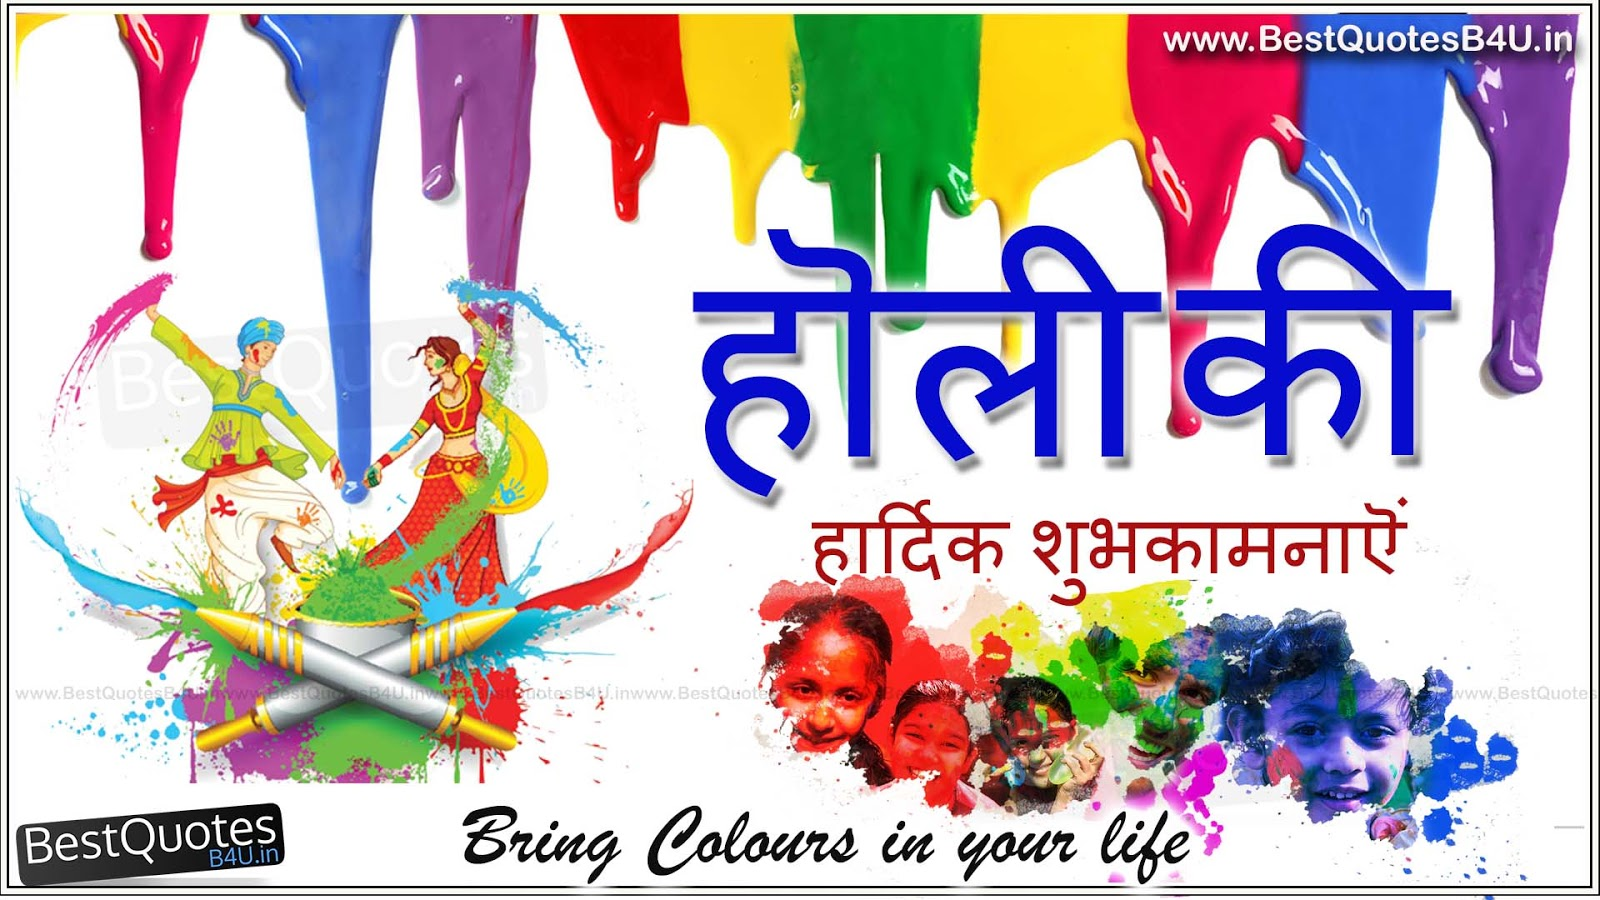 Happy holi 2016 greetings in hindi bestquotesb4u english happy holi 2016 greetings in hindi kristyandbryce Images